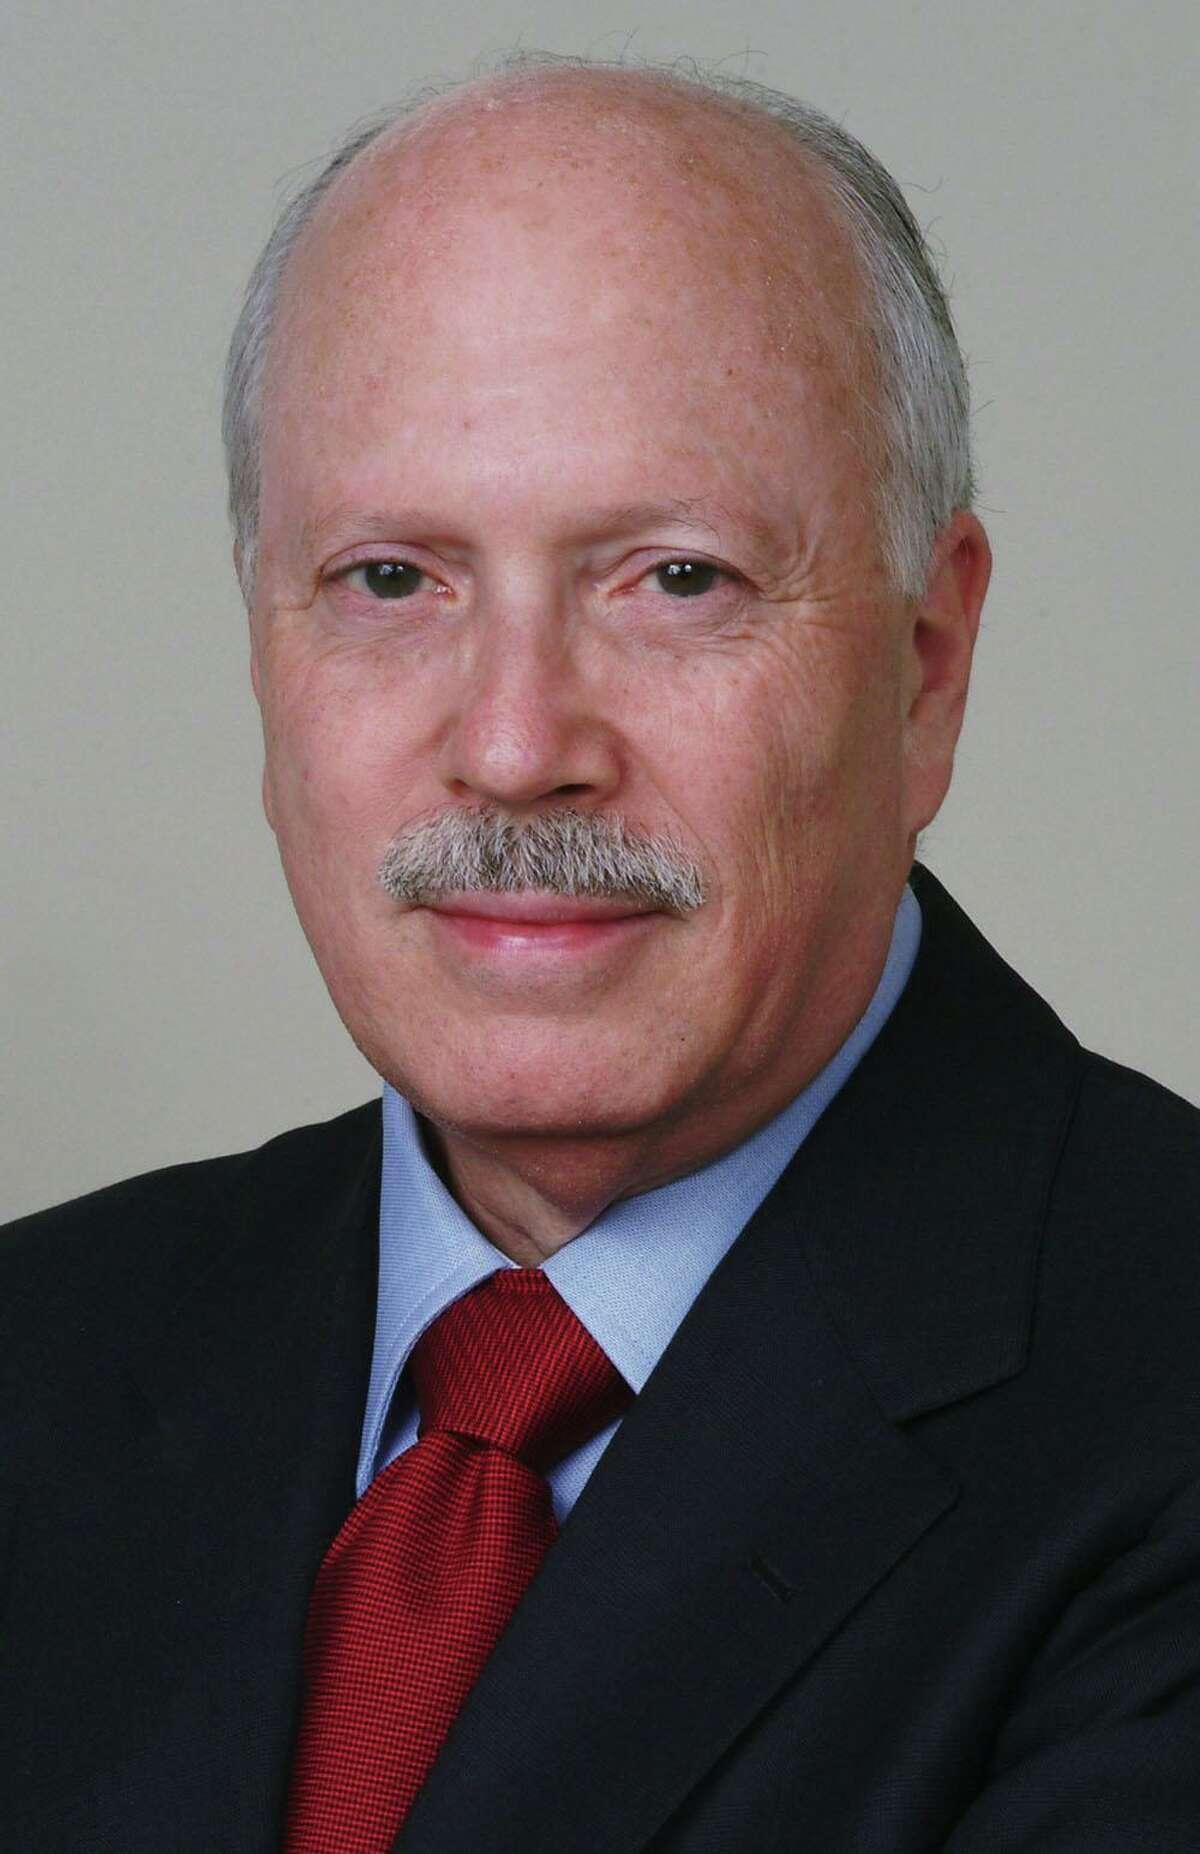 Gordon Joseloff, founder of WestportNow and former first selectman of Westport.